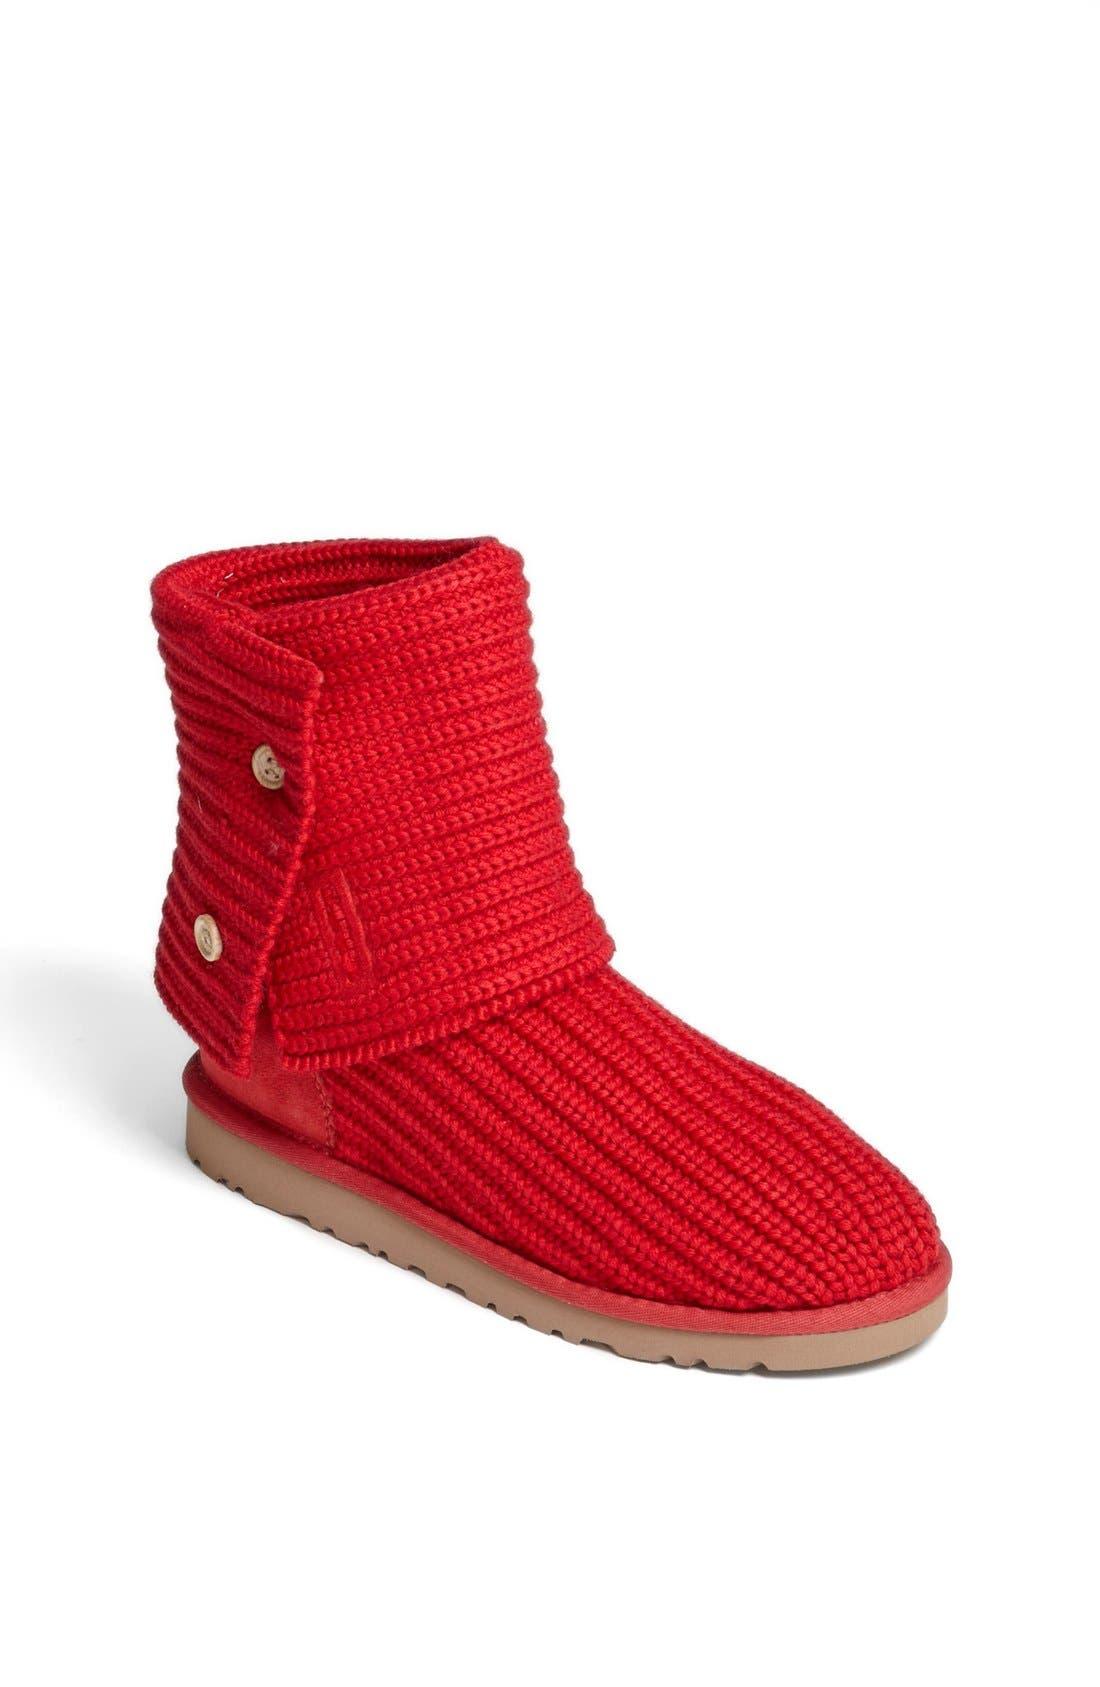 Main Image - UGG® 'Cardy' Crochet Boot (Toddler, Little Kid & Big Kid)